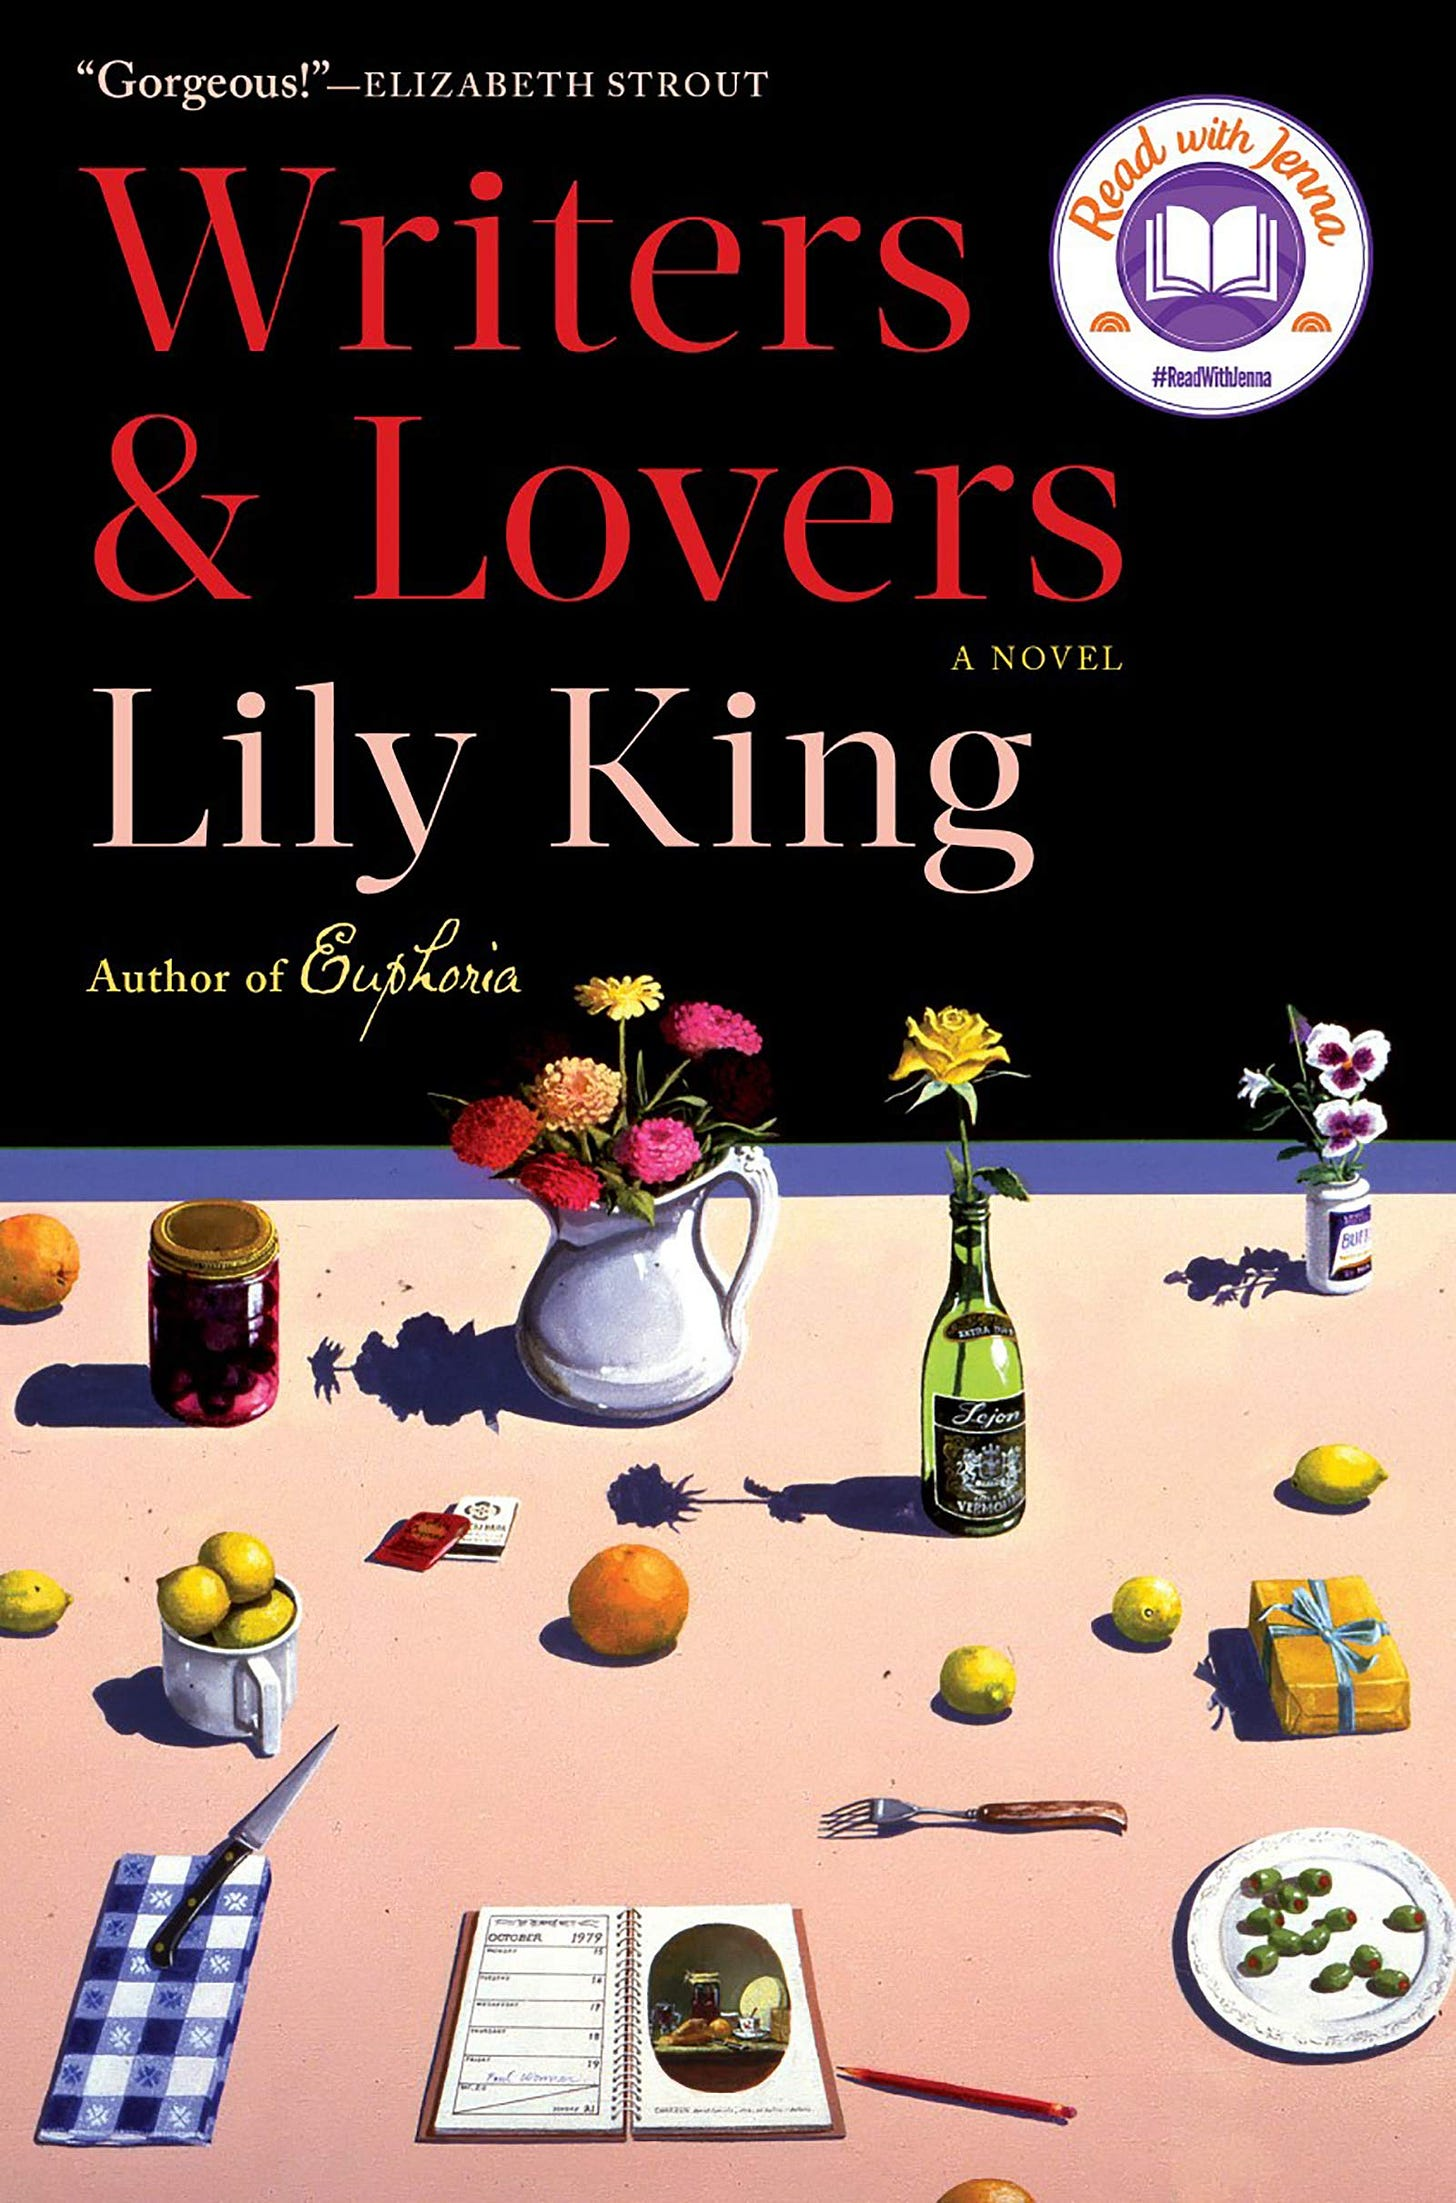 Writers & Lovers: A Novel: King, Lily: 9780802148537: Amazon.com: Books